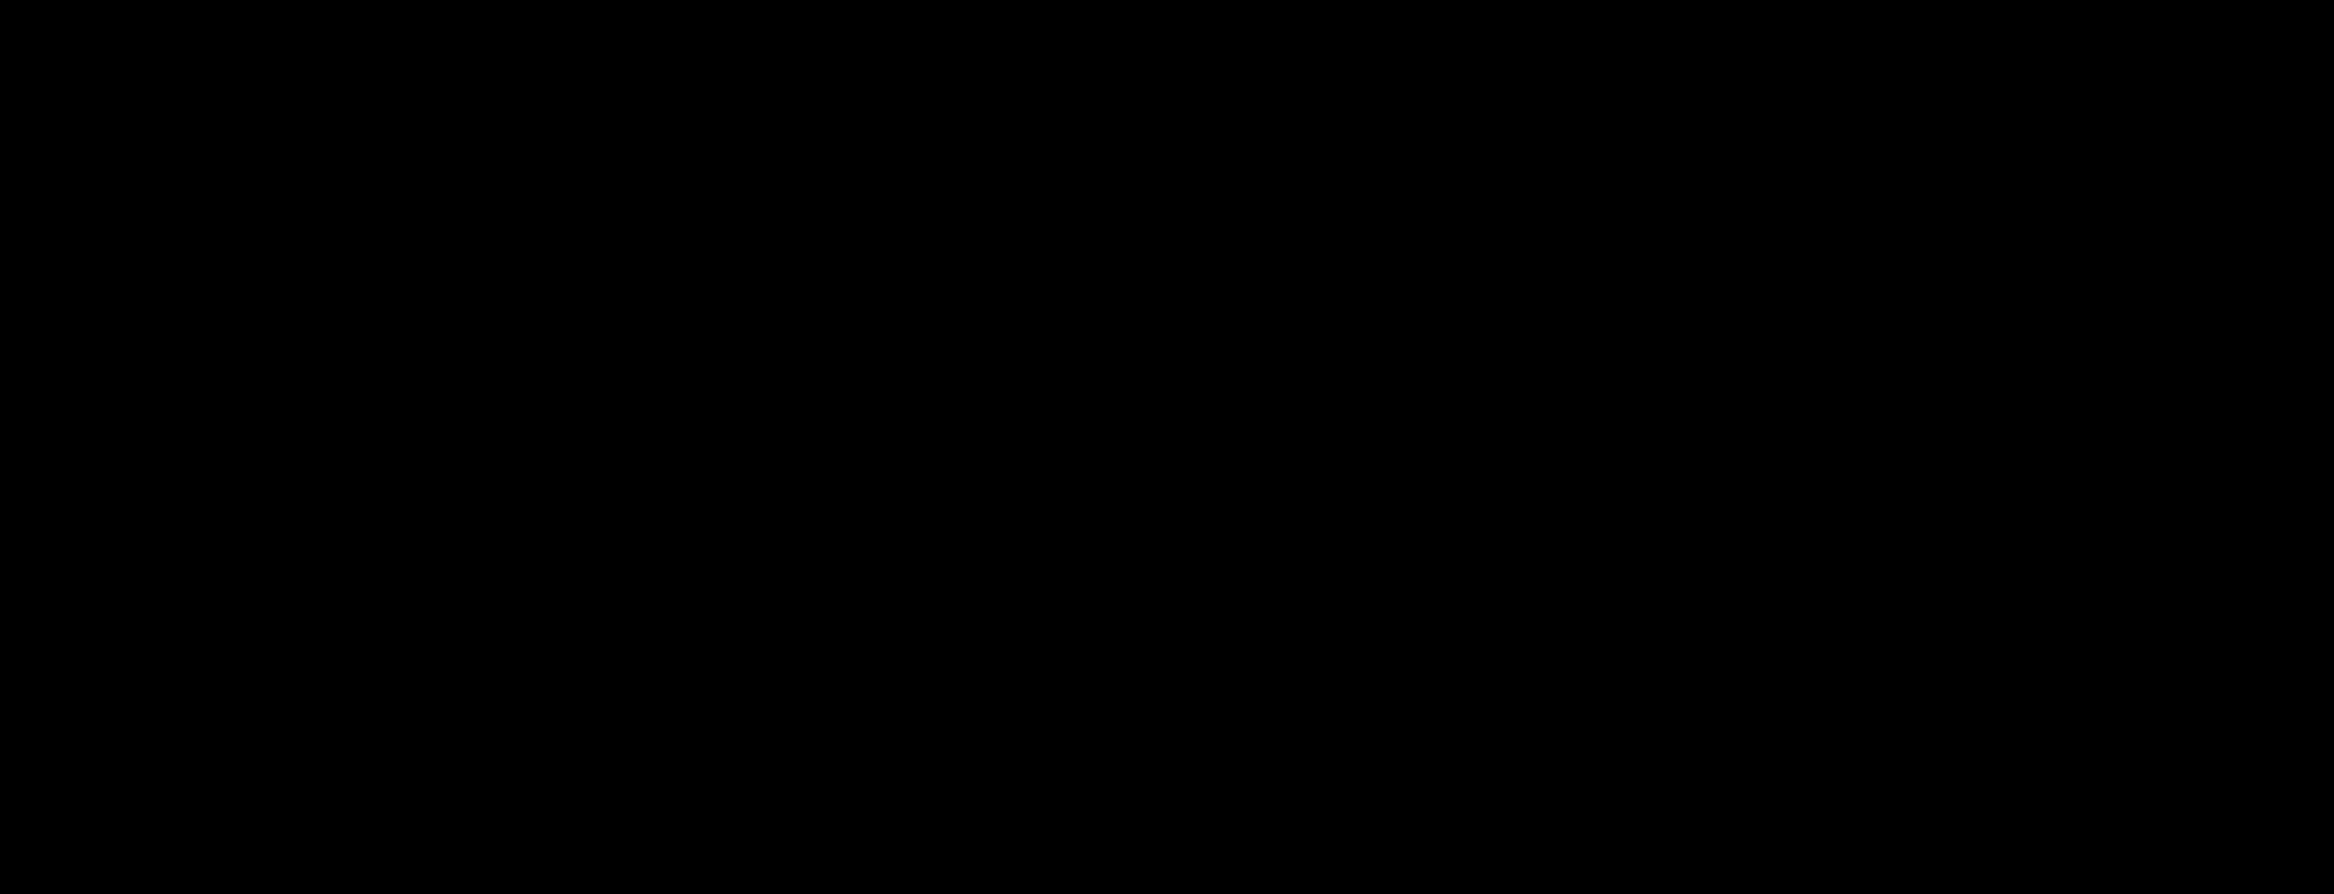 tert-Butyl-d<sub>9</sub> 6-(7-hydroxycoumarin-4-acetamido)hexyl carbamate